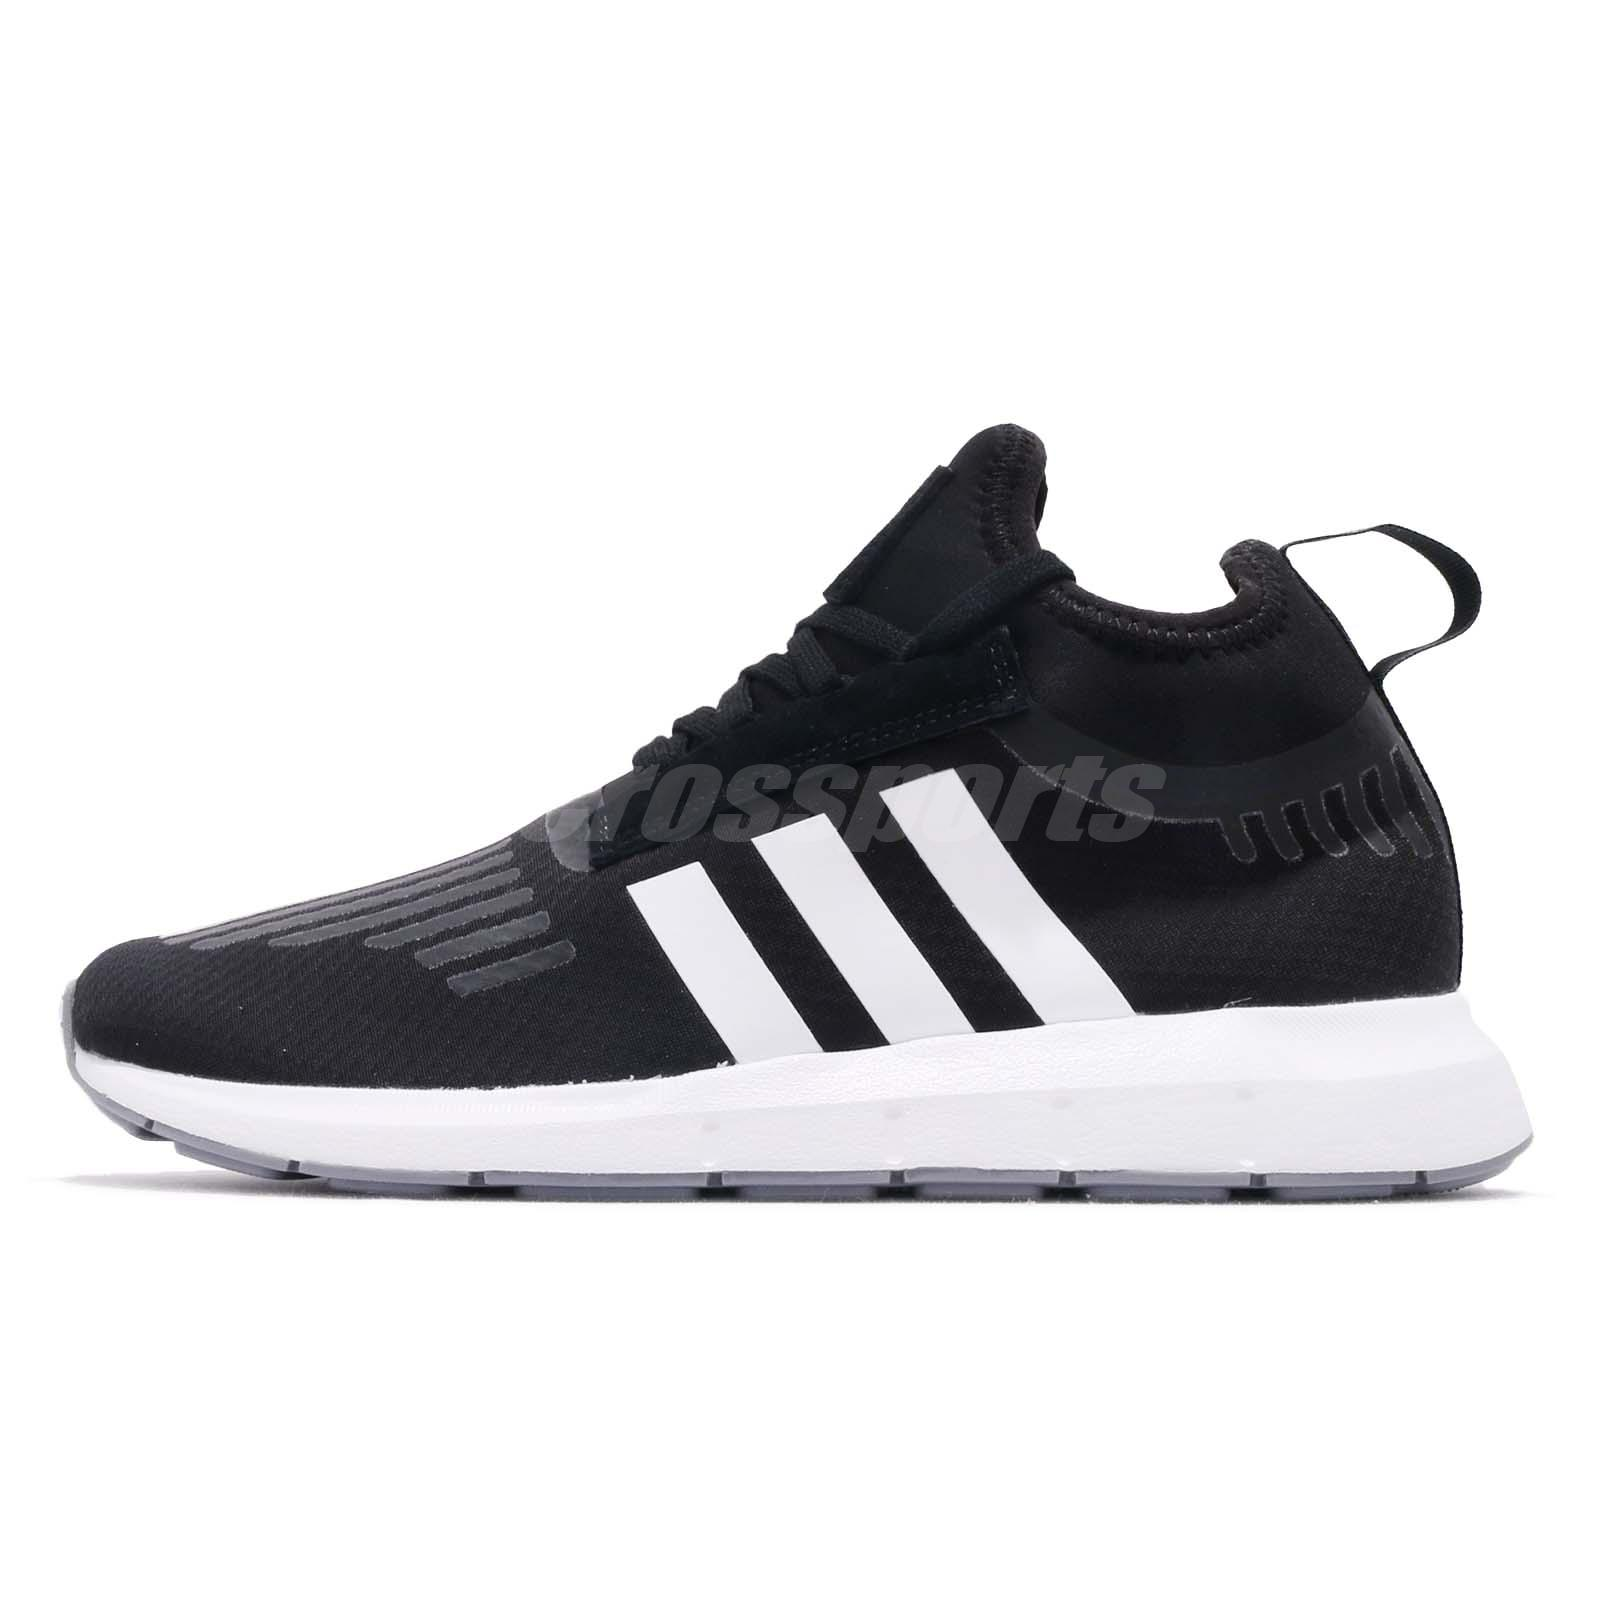 7f730af5e7e0b adidas Originals Swift Run Barrier Black White Grey Men Running Shoes B37701